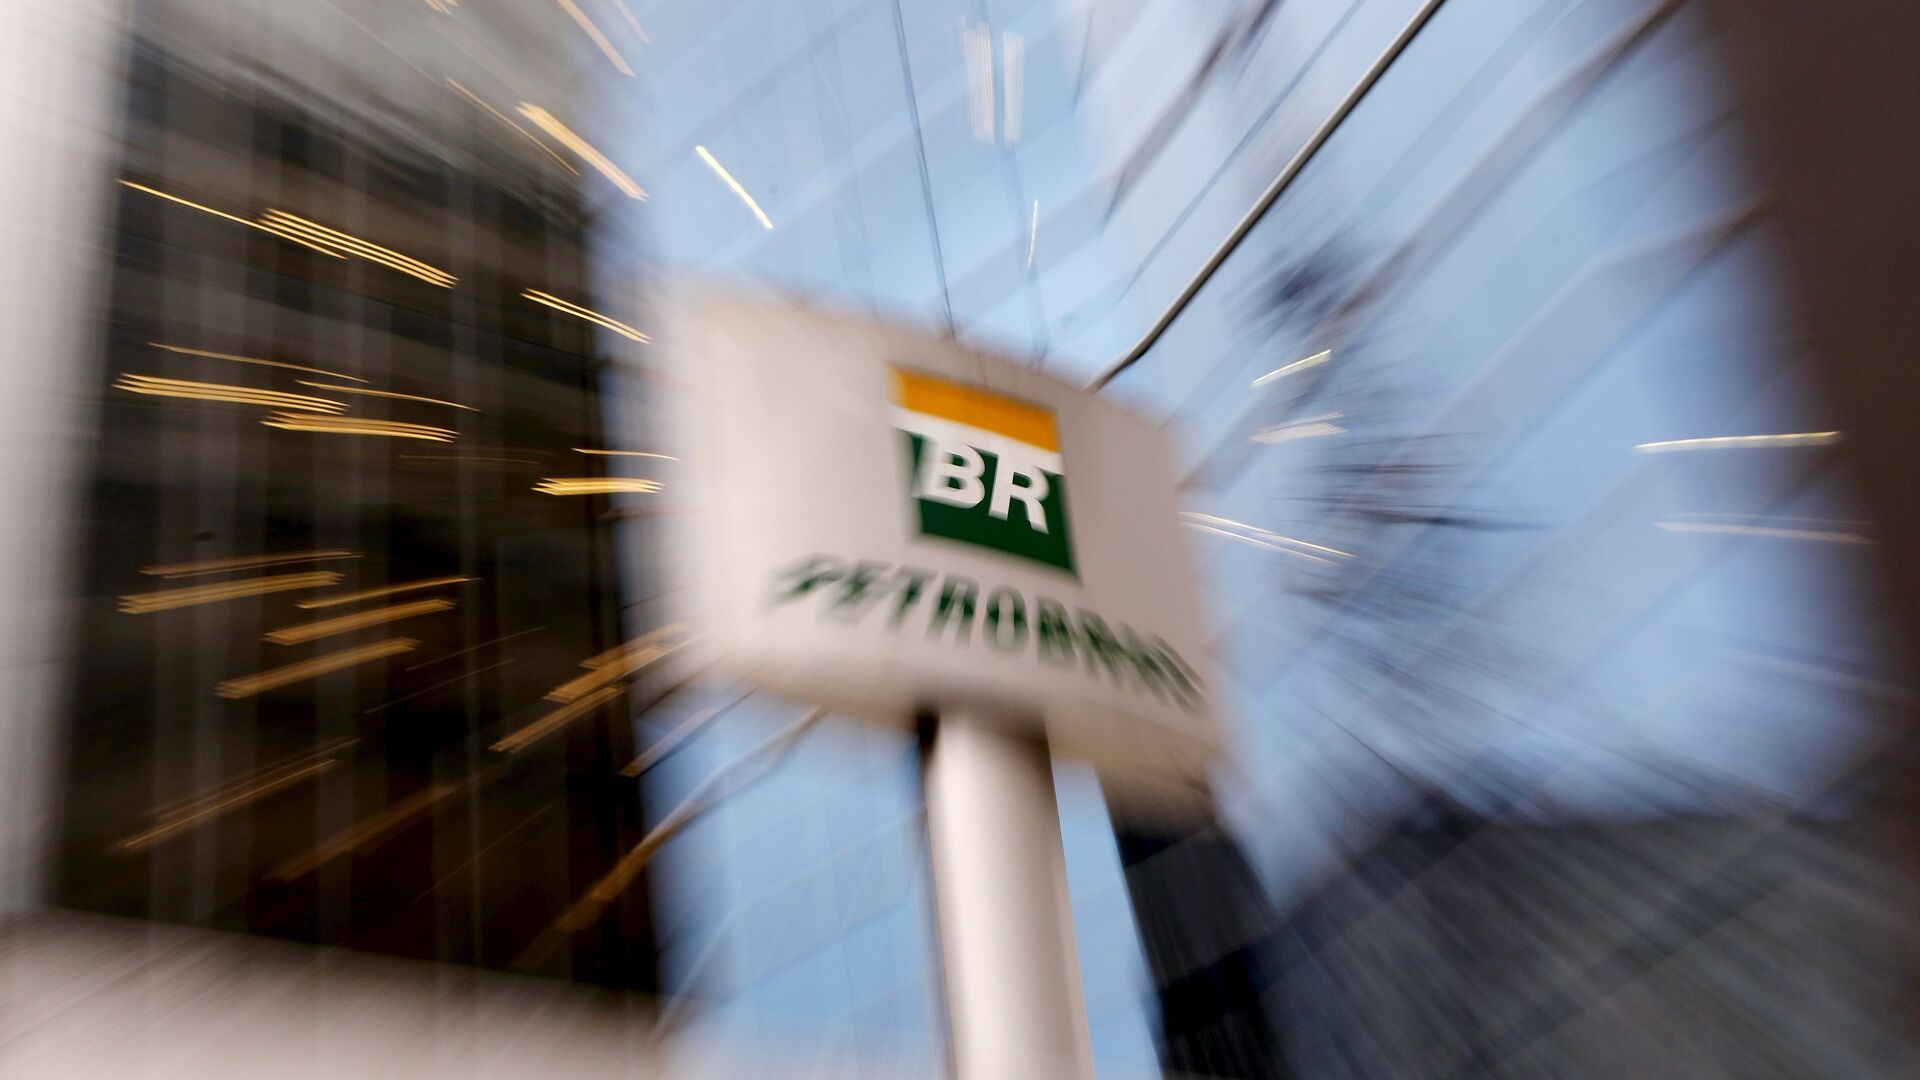 The Petrobras logo in front of the company's headquarters in Sao Paulo - Sputnik Mundo, 1920, 19.02.2021